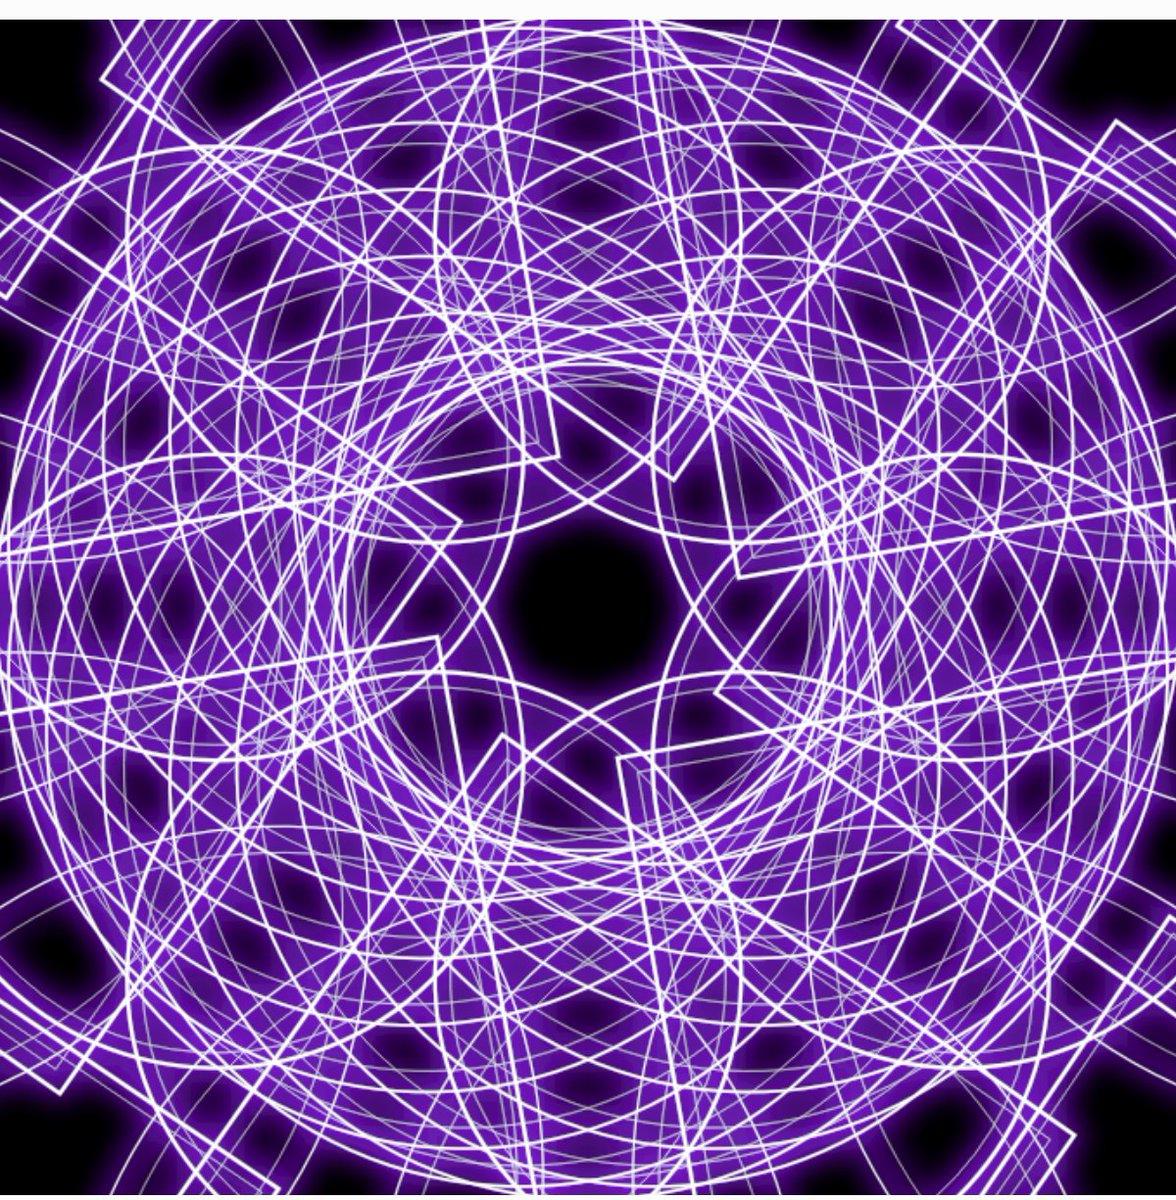 #generative #abstract #geometric #procedural #art #everyday #proceduralart #creativecoding #bot